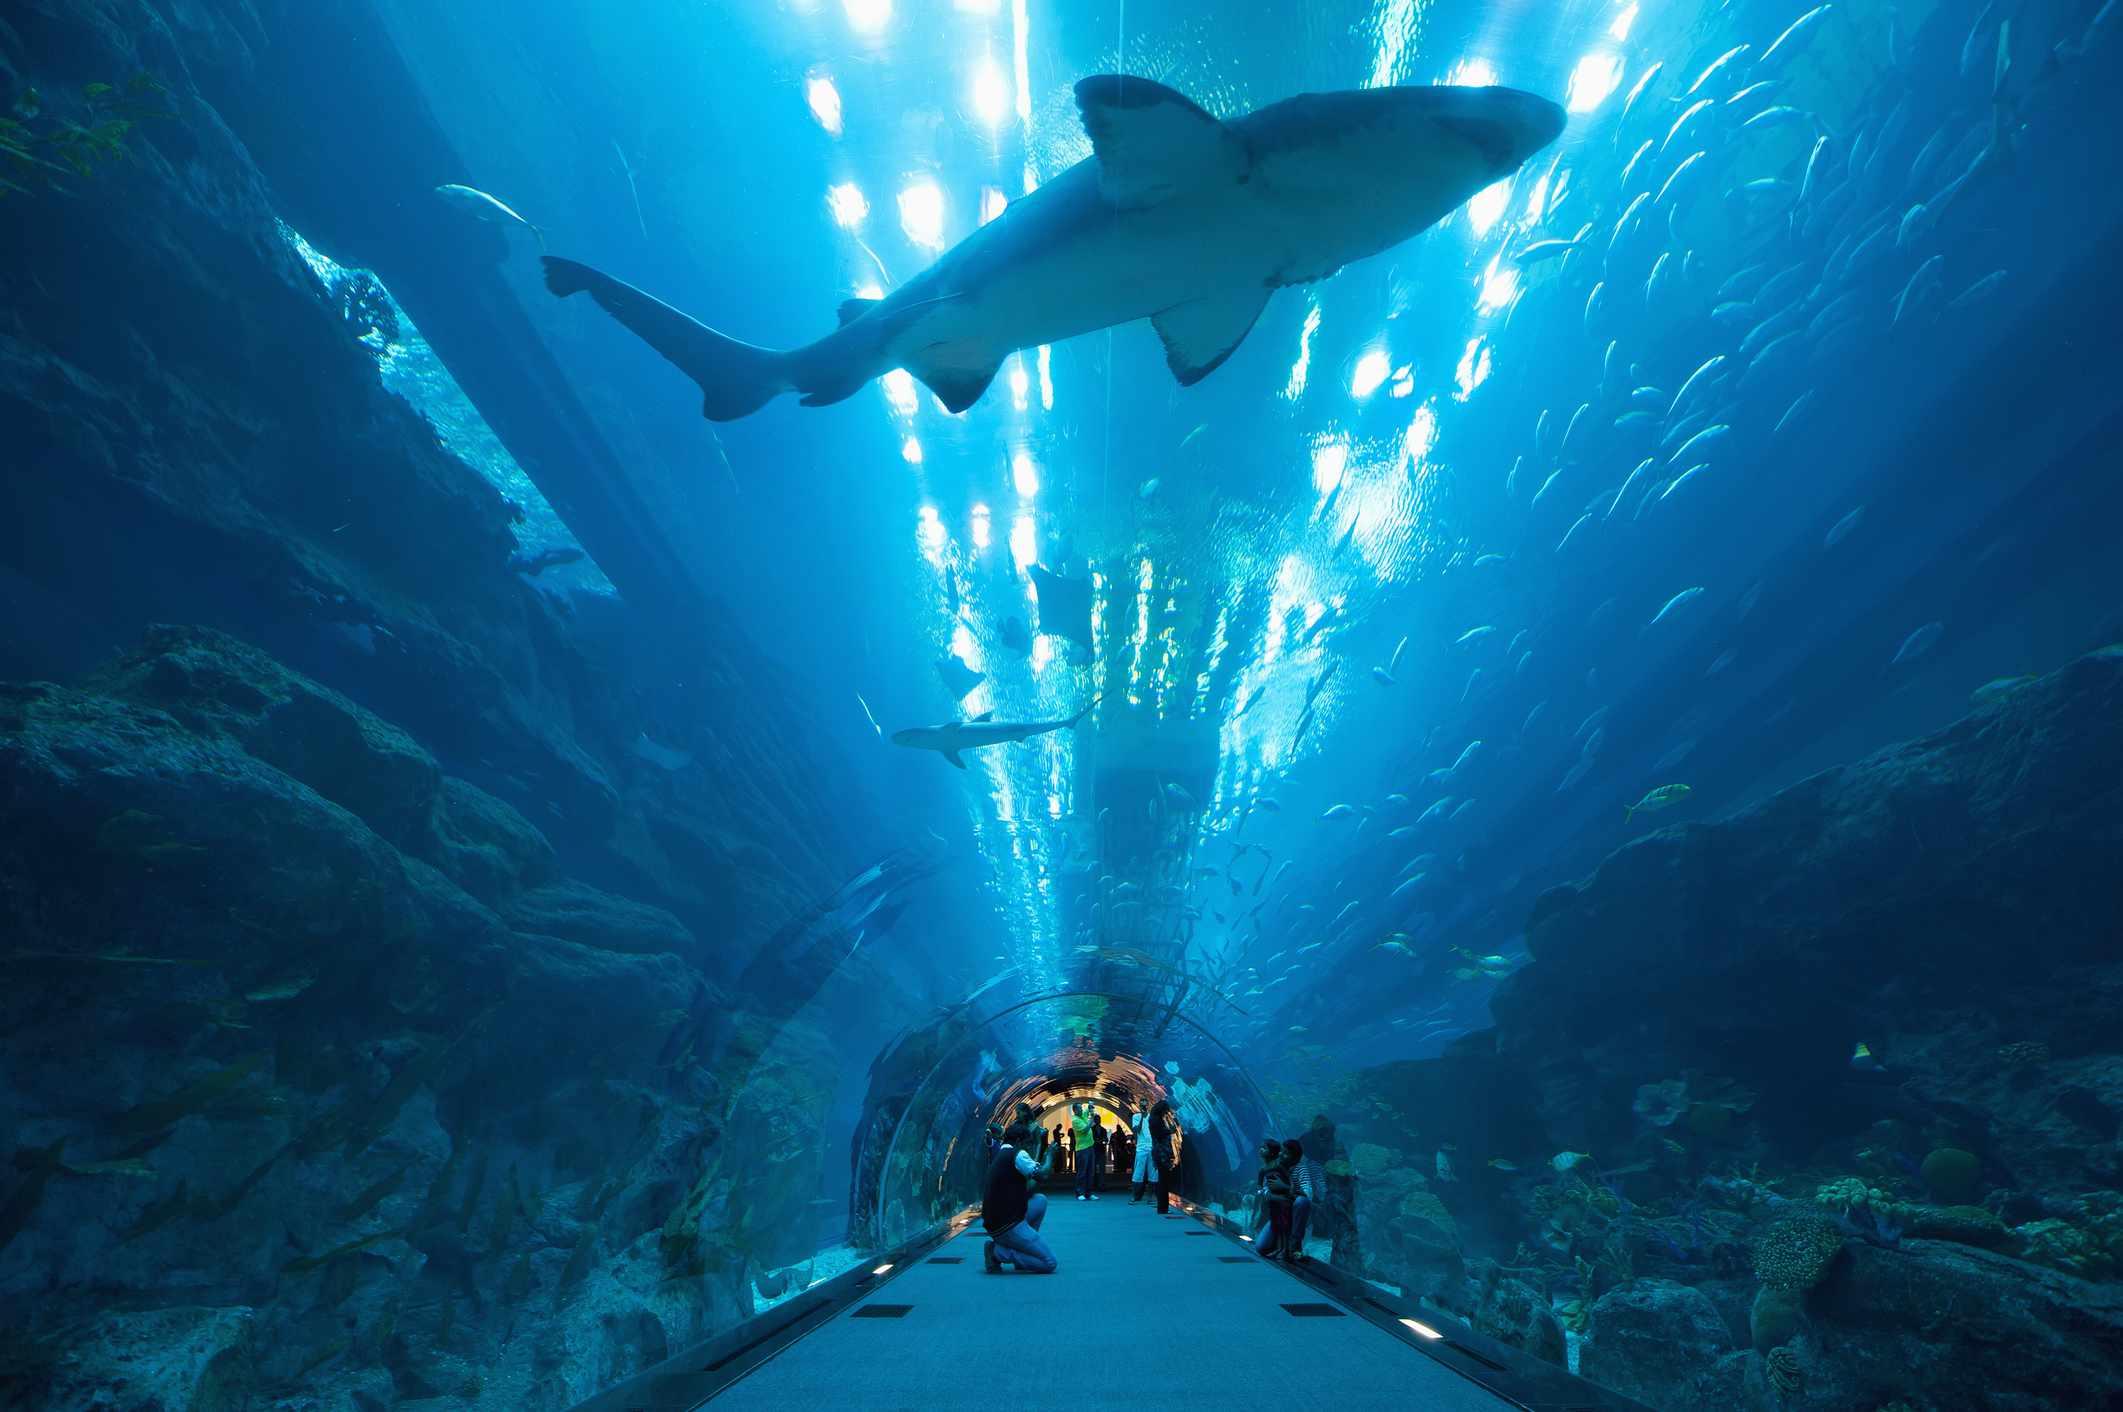 Sharks Swimming Above People In Tunnel, Dubai Mall Aquarium; Dubai, United Arab Emirates